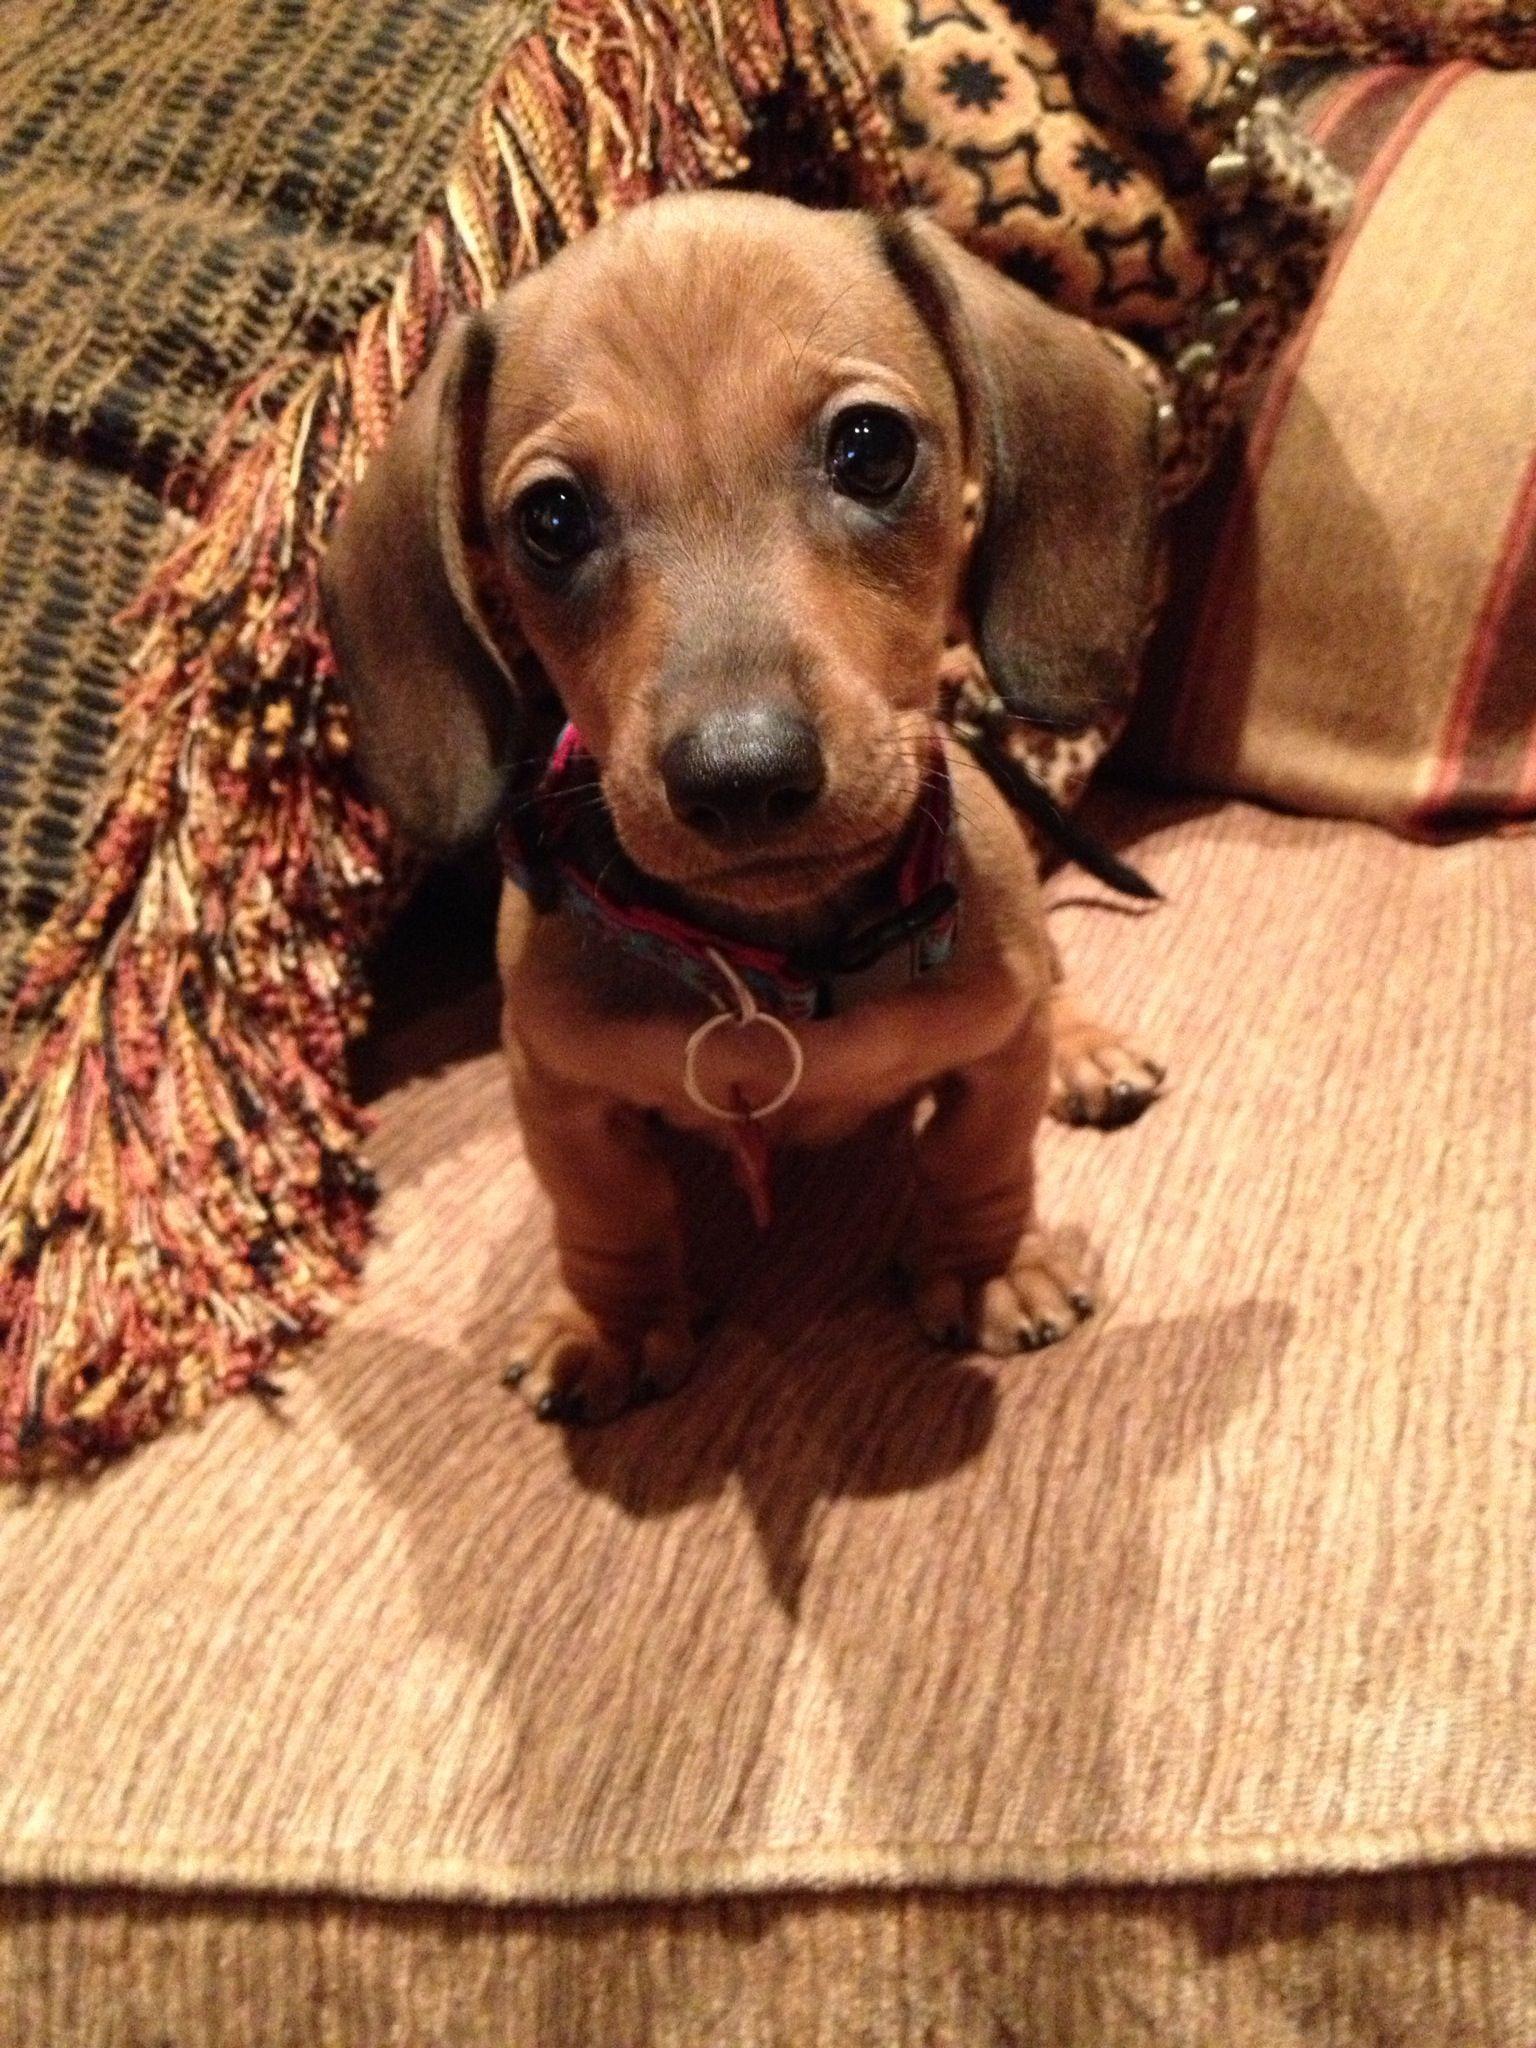 Everybody Meet Choco Latte Aka Choco Cl C Leezy Chocchoc And Lattes O Choc My New Puppy Miniature Dachshund Cuteness Pets Dachshund Puppies Puppies